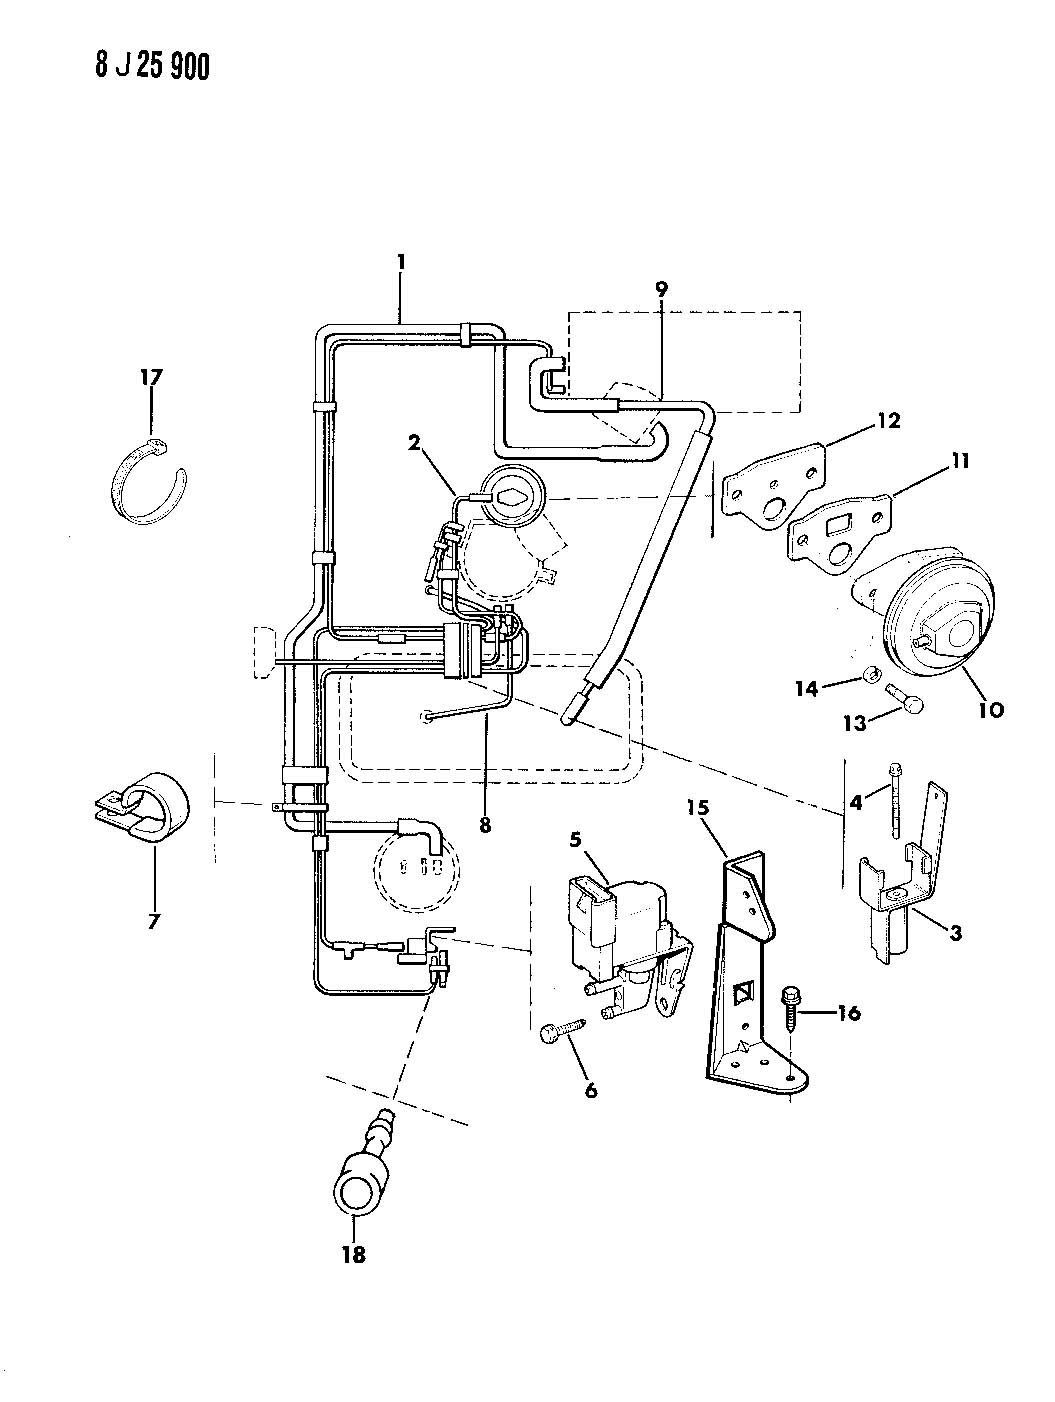 wrangler 4 2 engine diagram great installation of wiring diagram 1999 Oldsmobile 88 Wiring-Diagram jeep 4 2 engine diagram wiring library rh 2 pgserver de pontiac 2 4 engine diagram dodge